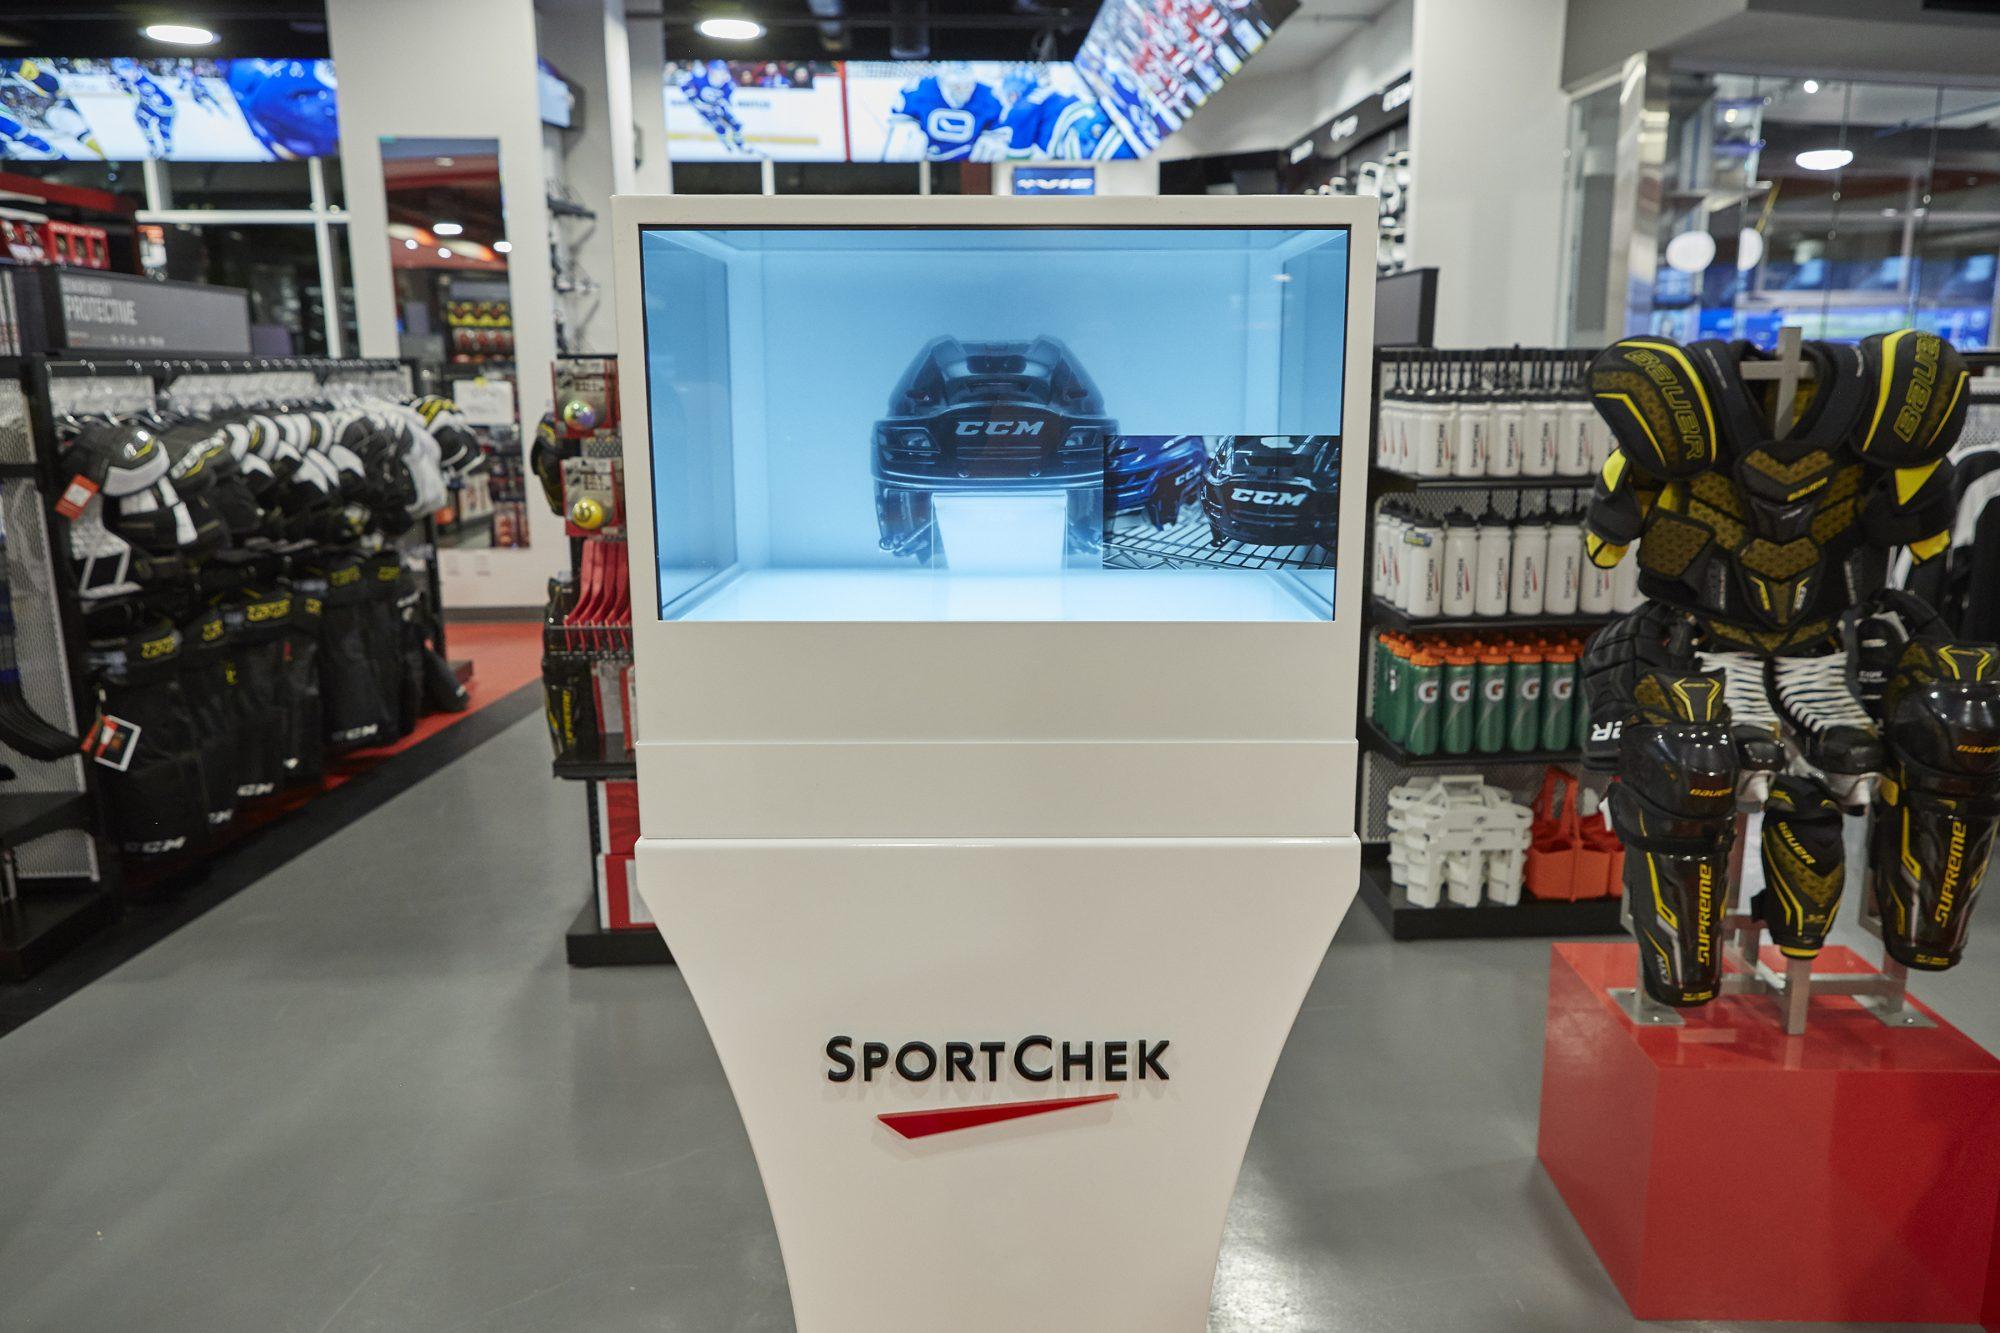 Sport Chek Robson St_3D hologram showcase boxes_1